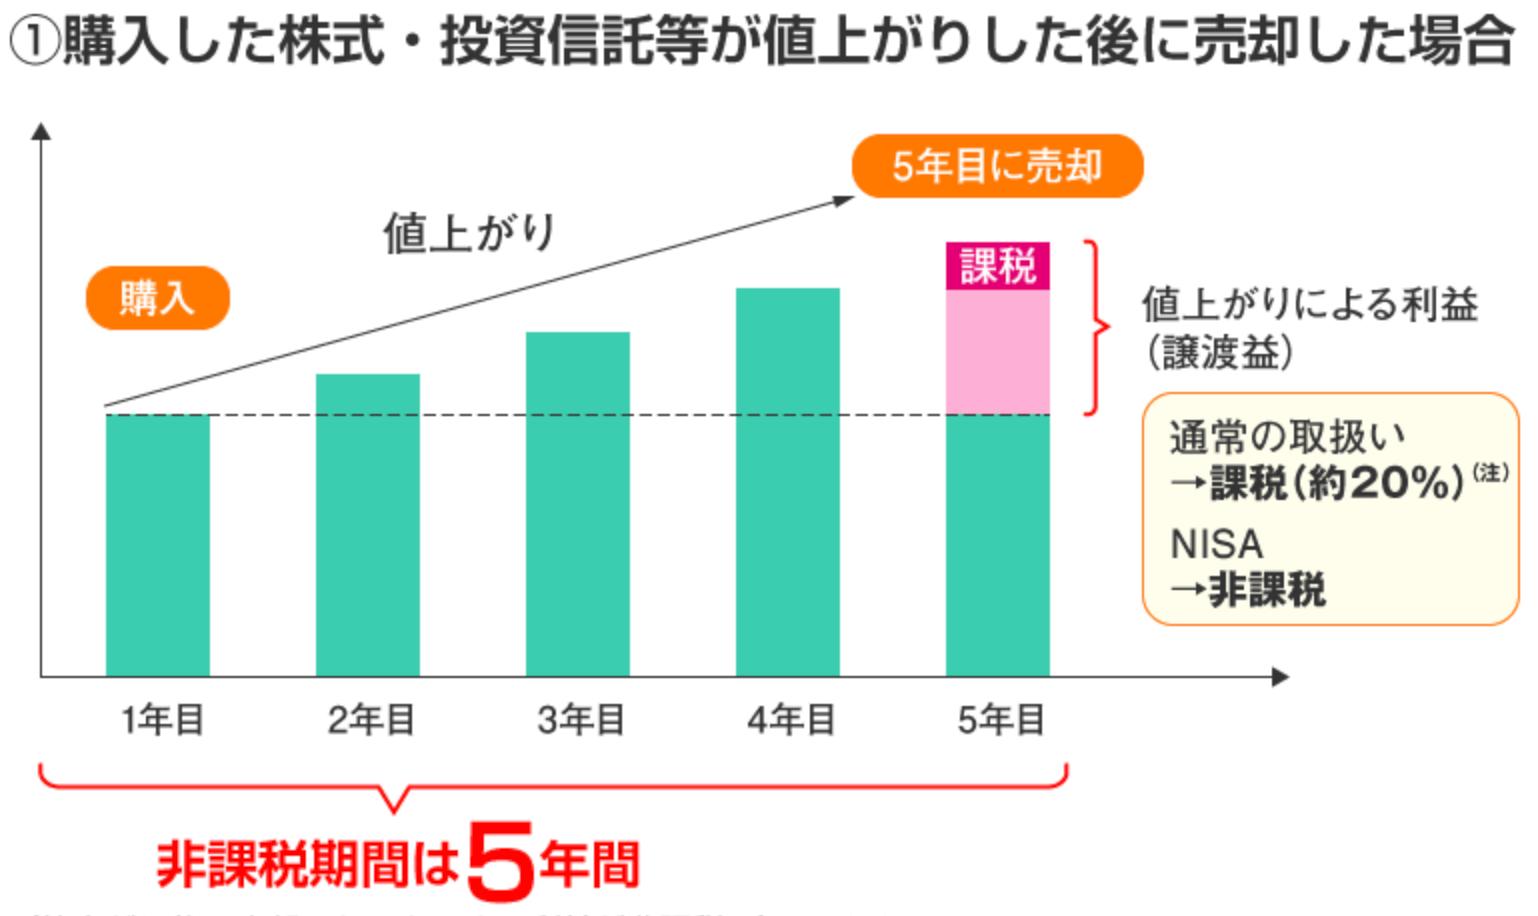 NISAの非課税で得られる利益の仕組み